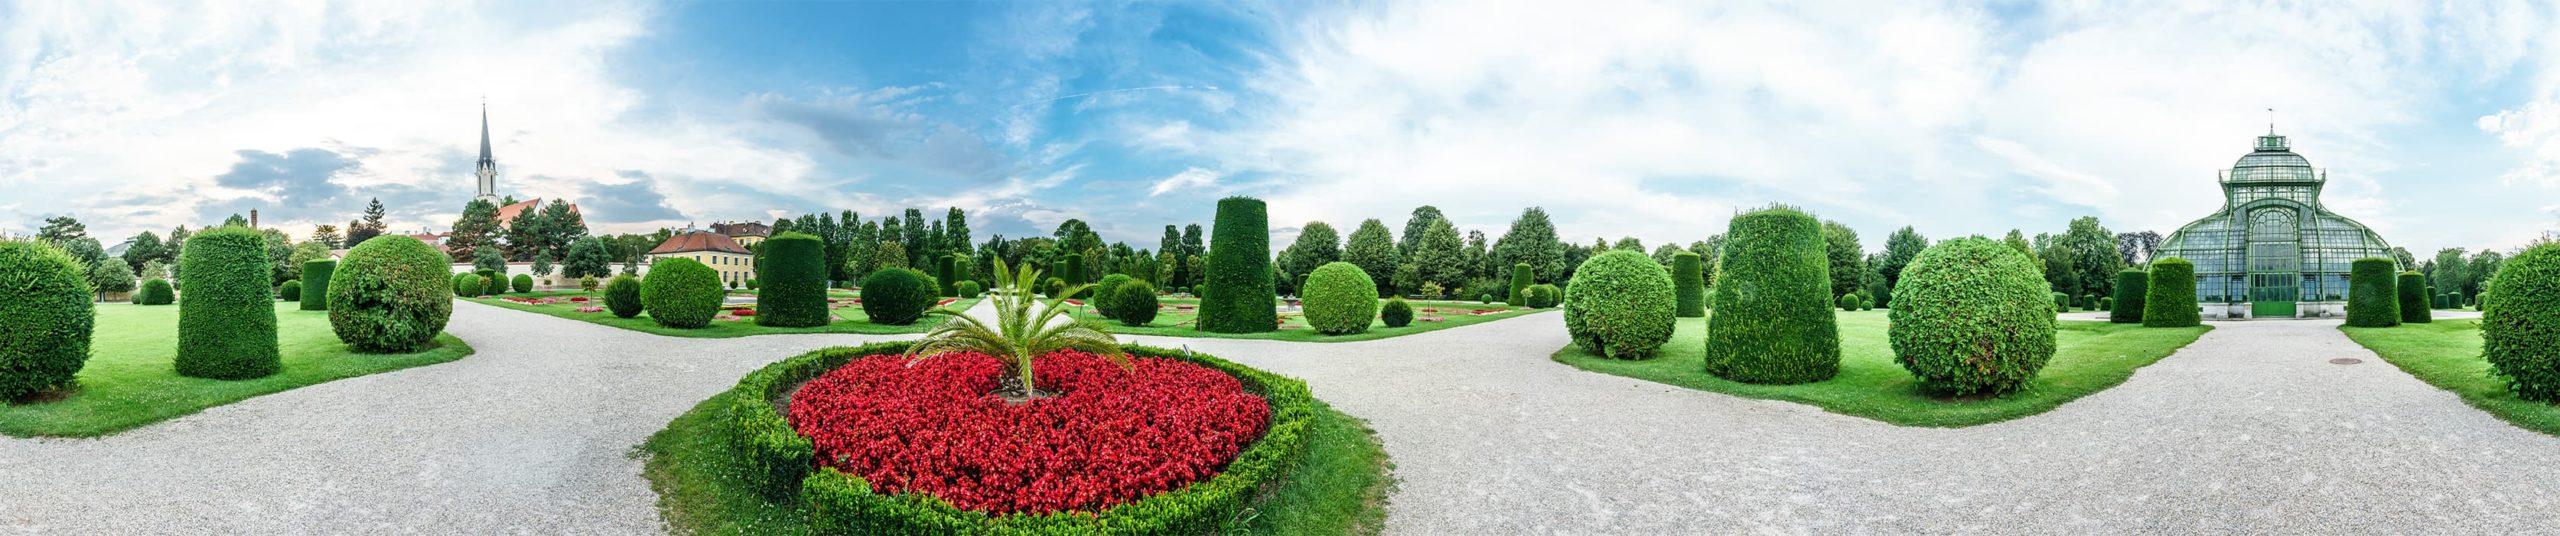 wien-panorama-palmenhaus